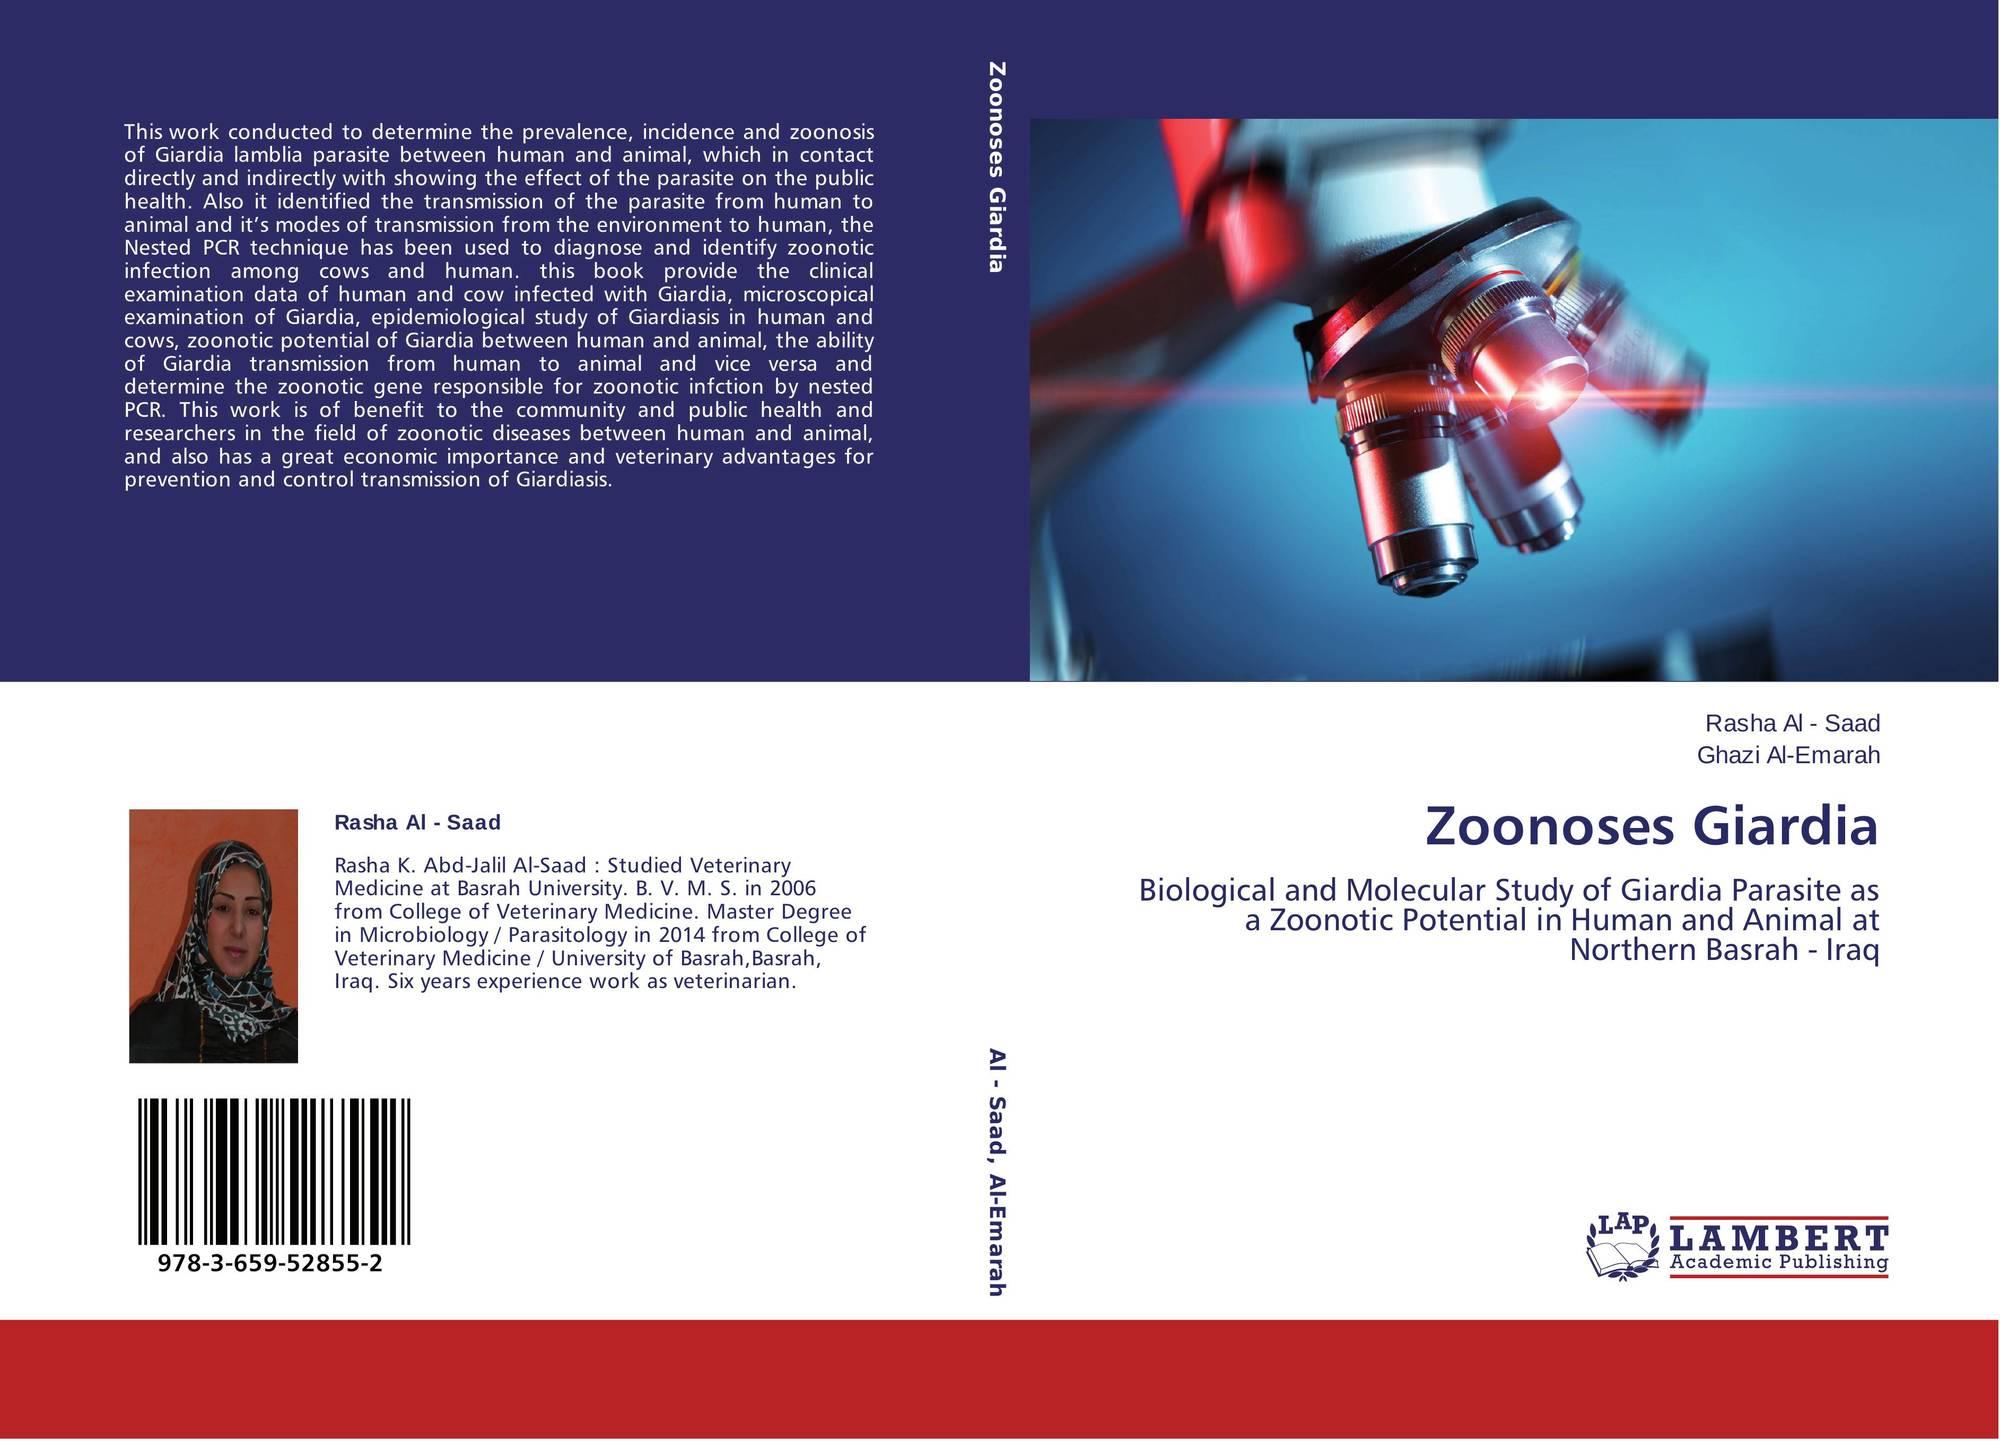 giardia zoonotic potential